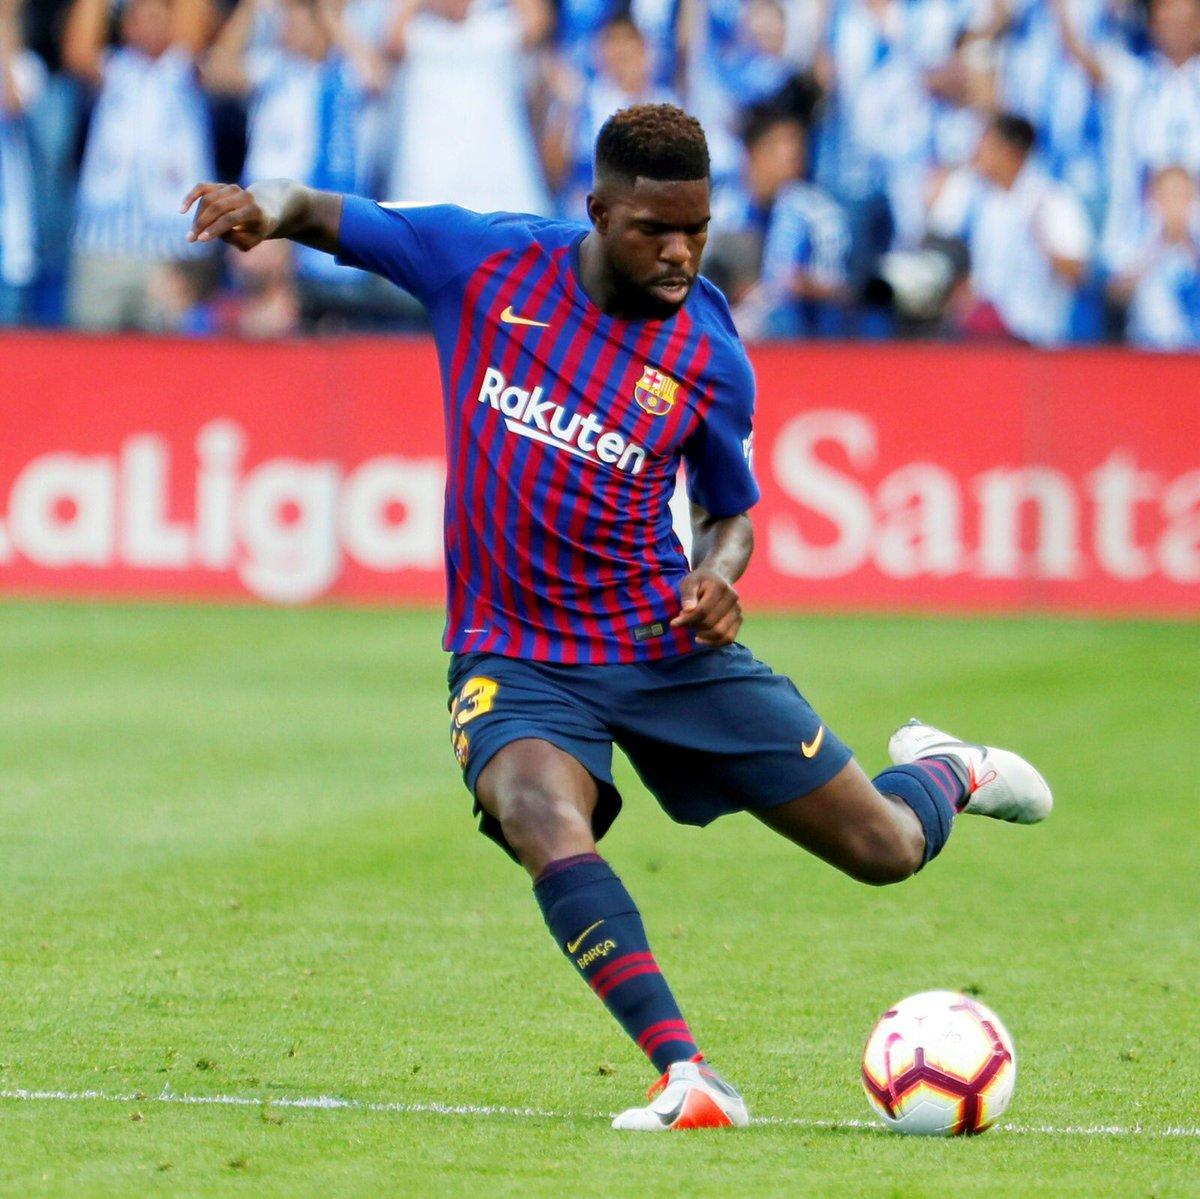 😏 Awesome start in @LaLigaEN 🙌 ✅#BarçaAlaves ✅#ValladolidBarça ✅#BarçaHuesca ✅#RealSociedadBarça 🔜 @ChampionsLeague